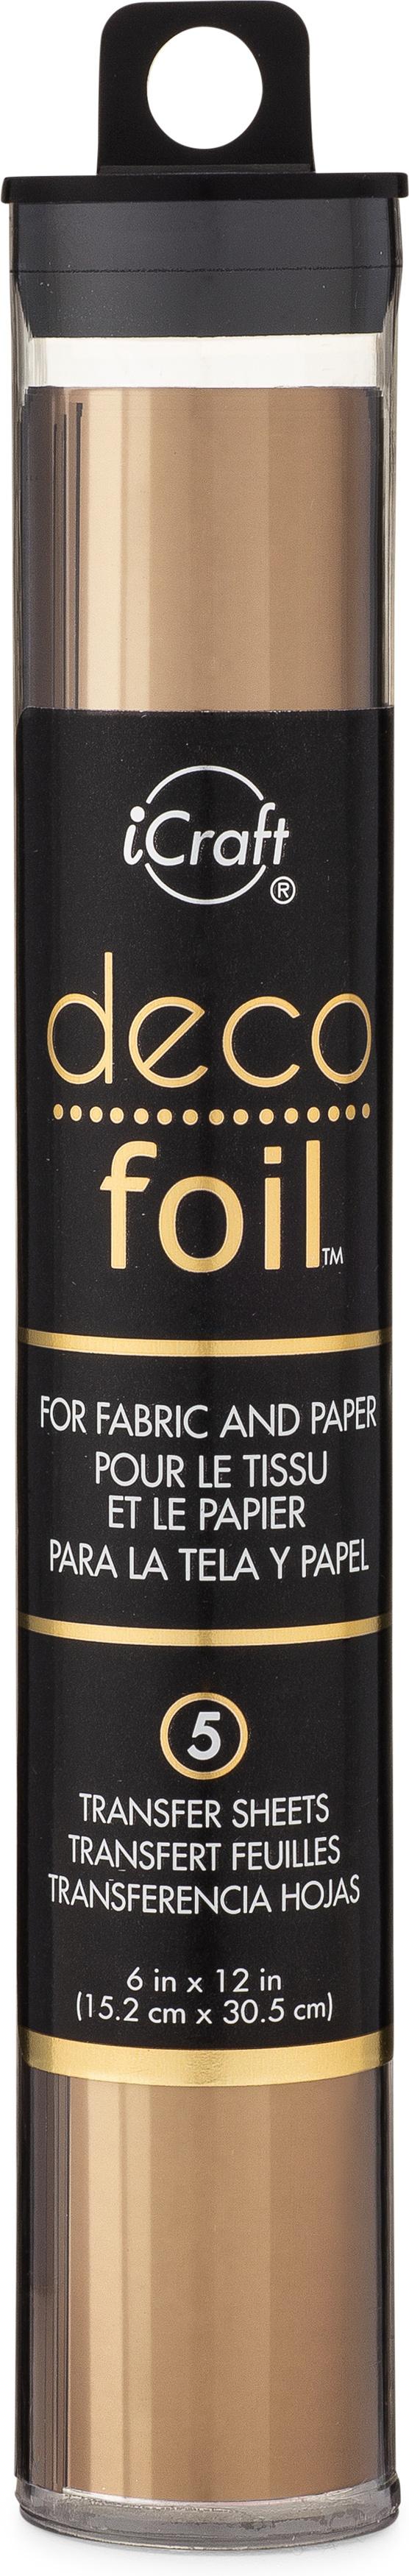 Deco Foil Transfer Sheets 6X12 5/Pkg-Bronze